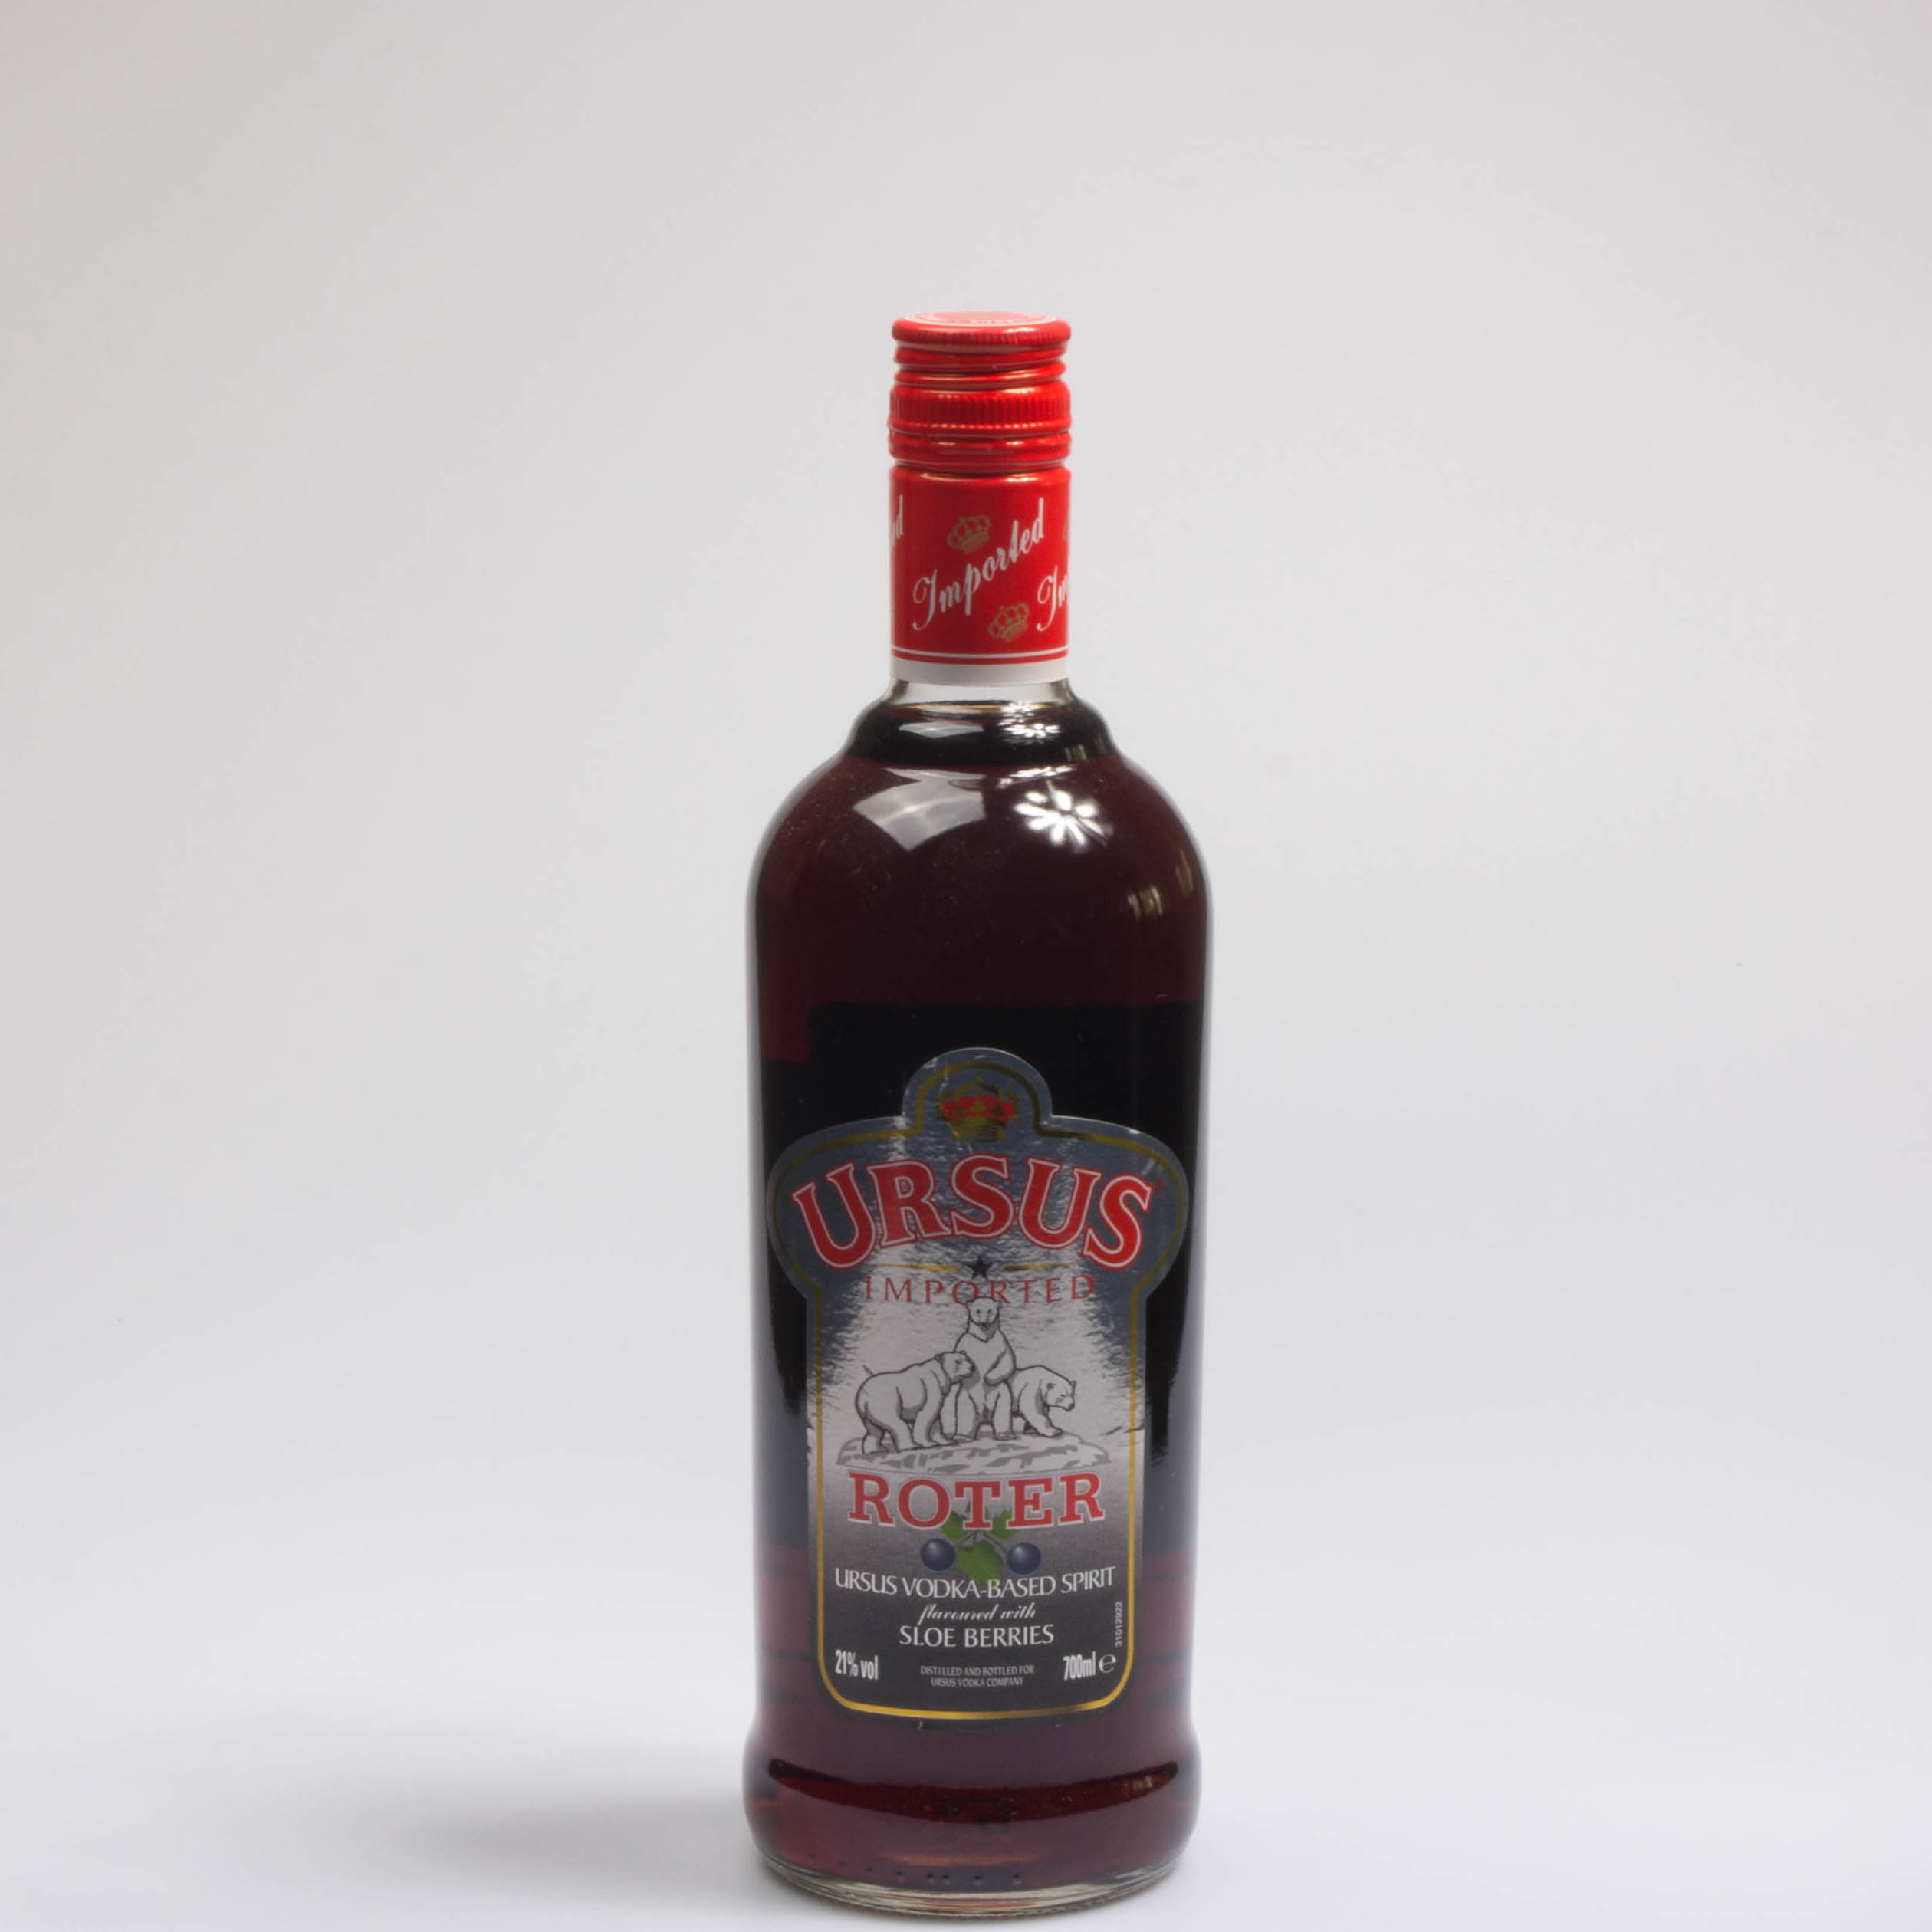 Ursus Rood 1 liter